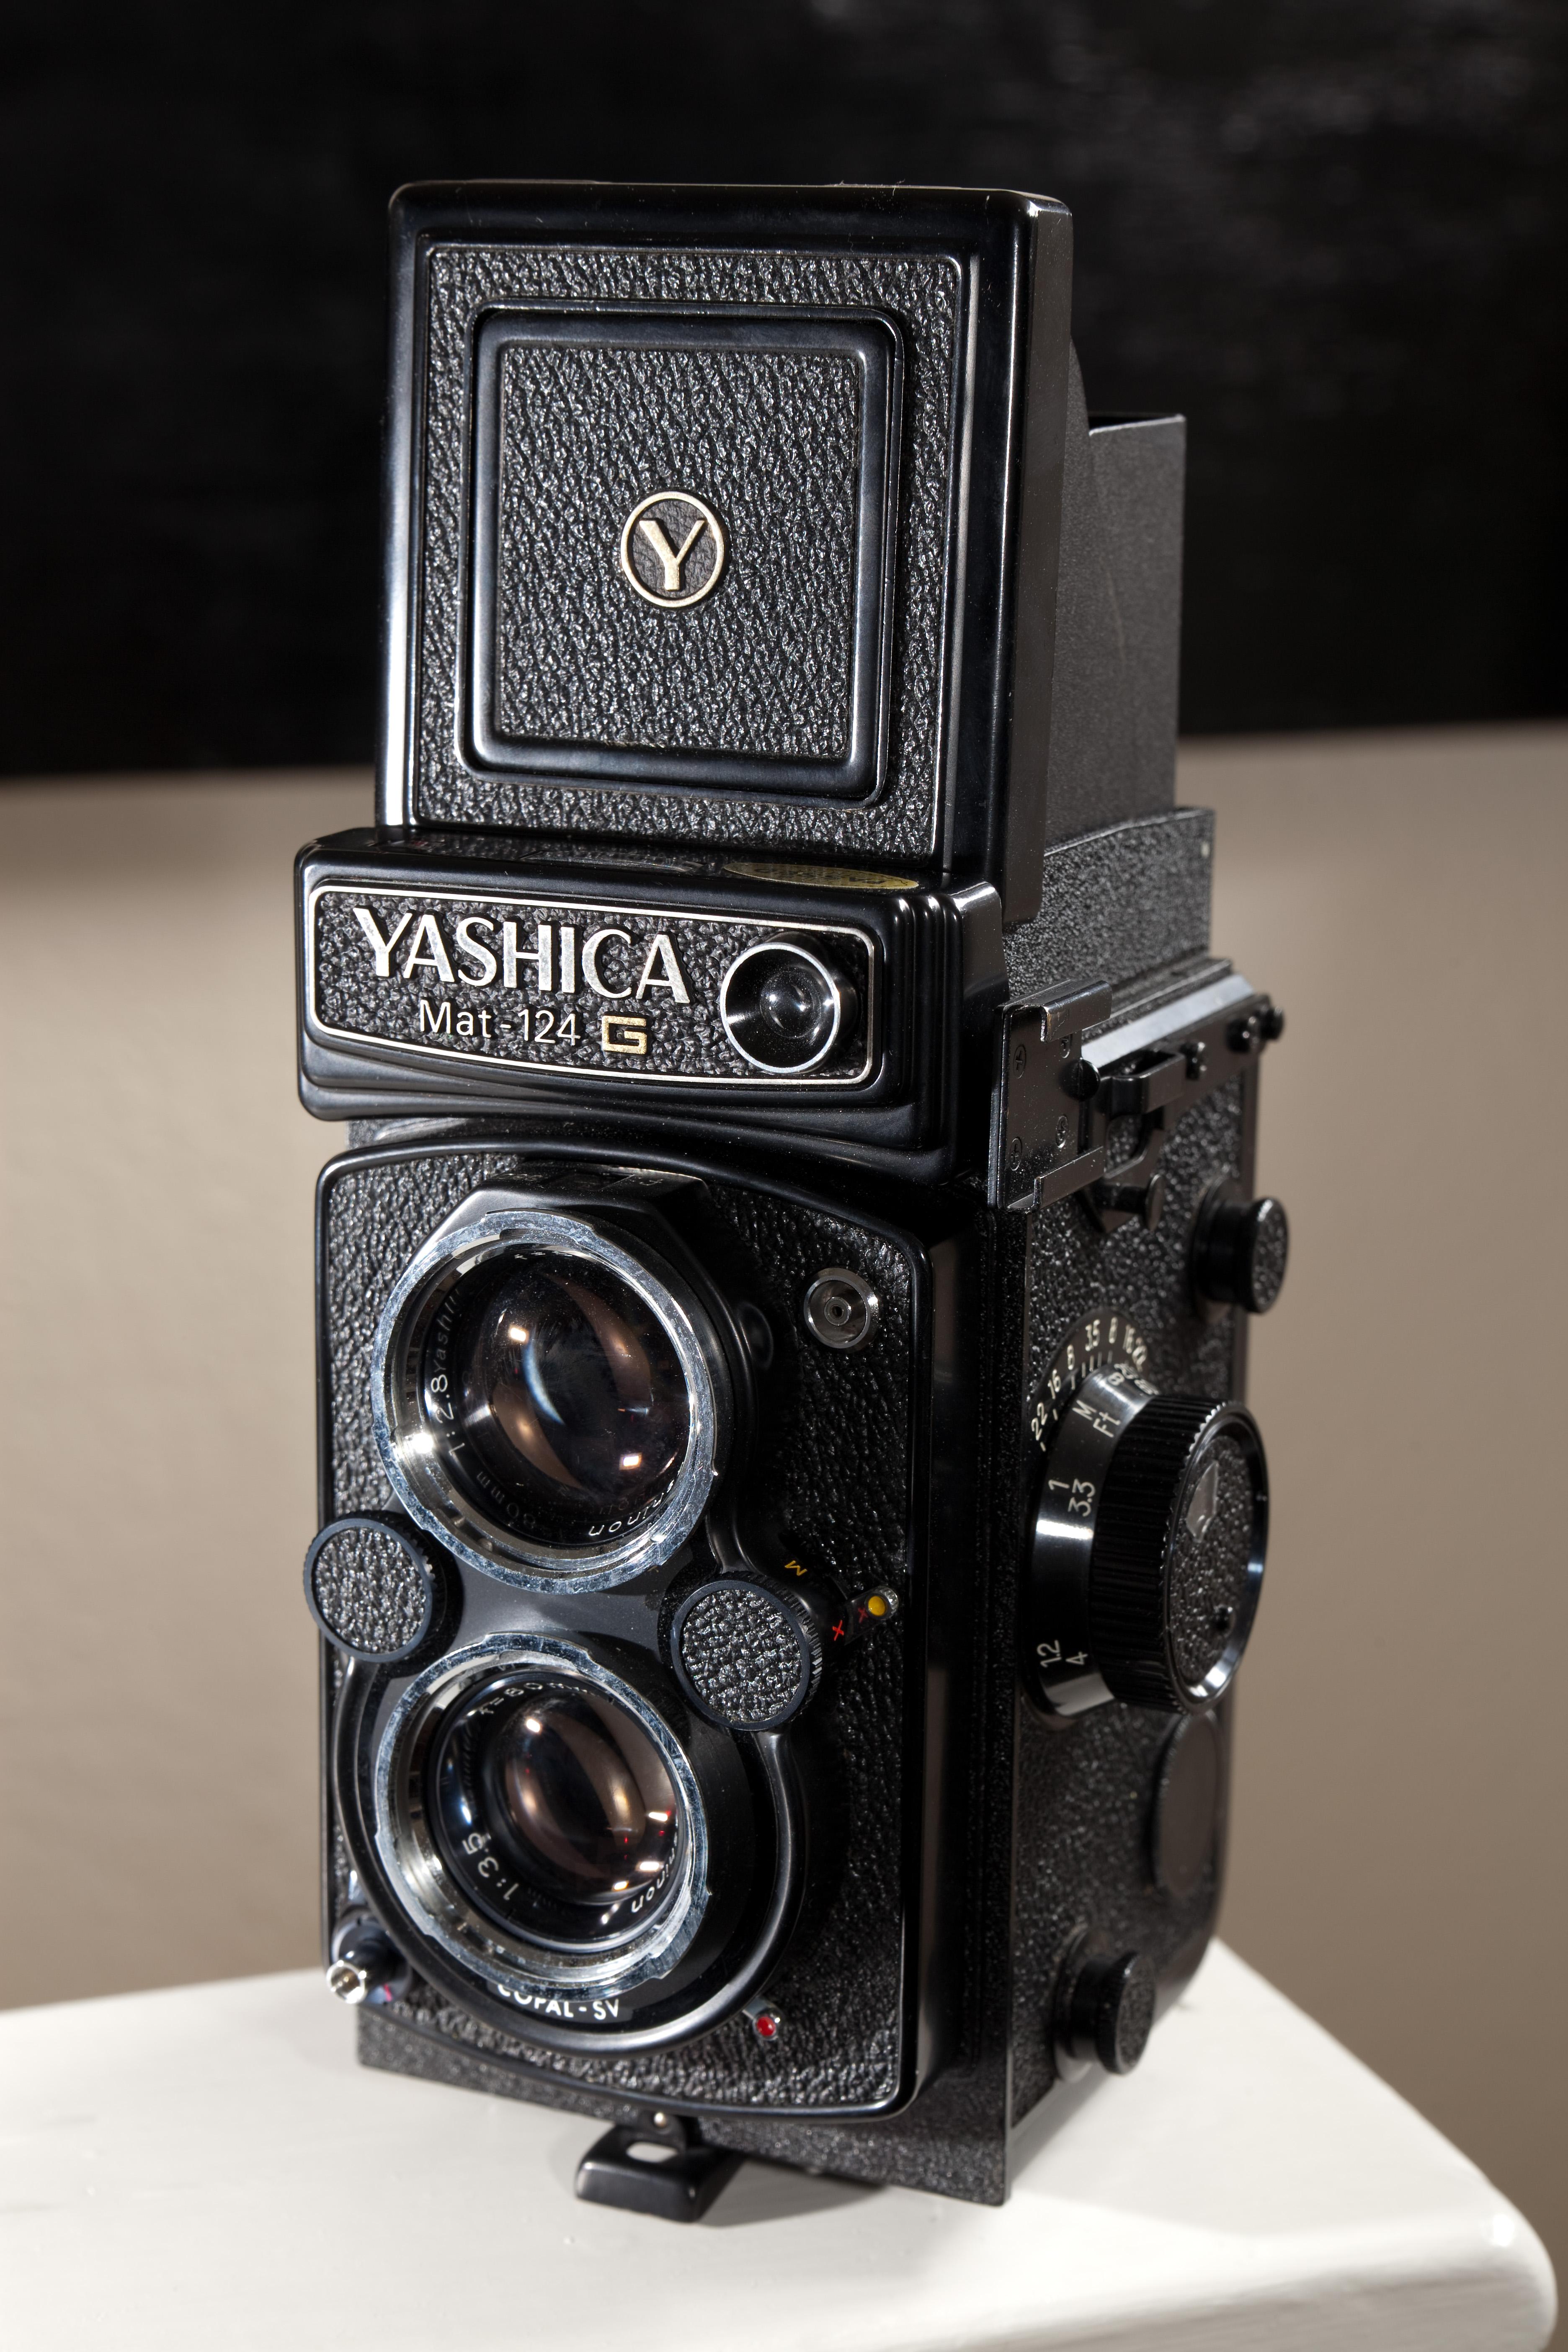 Yashica_Mat_124G_5033 (1)